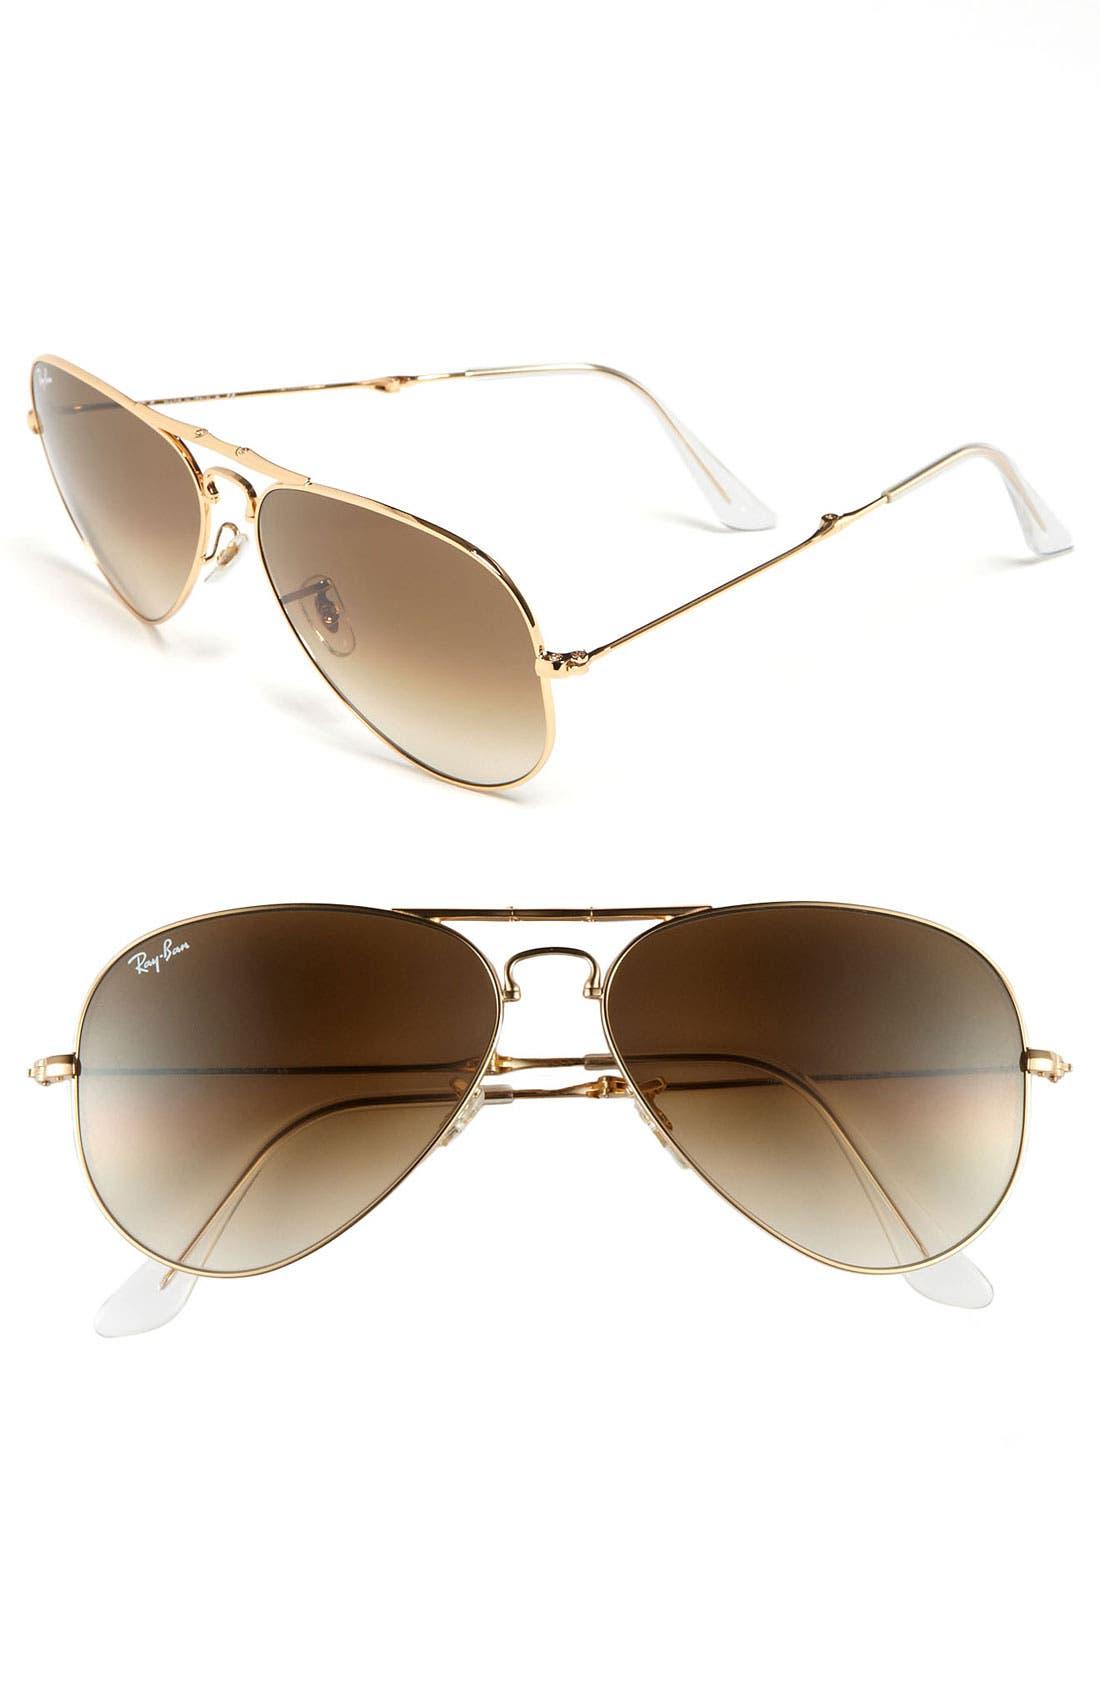 ray ban 58mm polarized folding aviator sunglasses